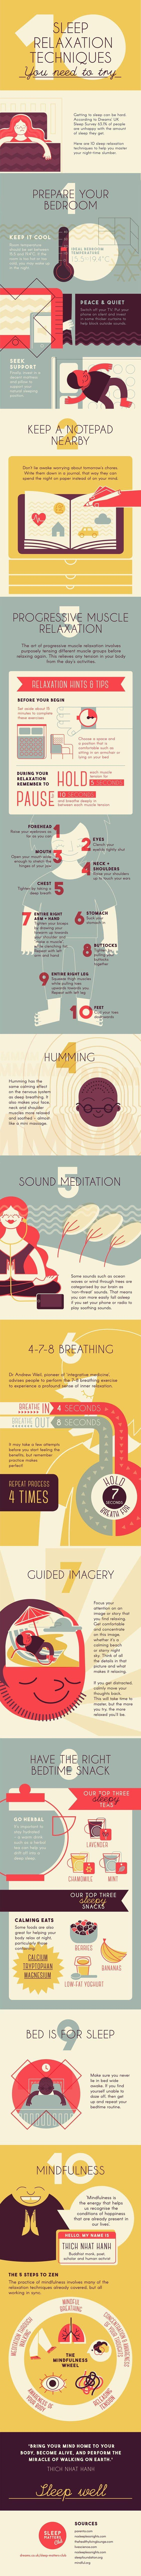 10 Sleep Relaxation Techniques #Infographic #Health #Sleep